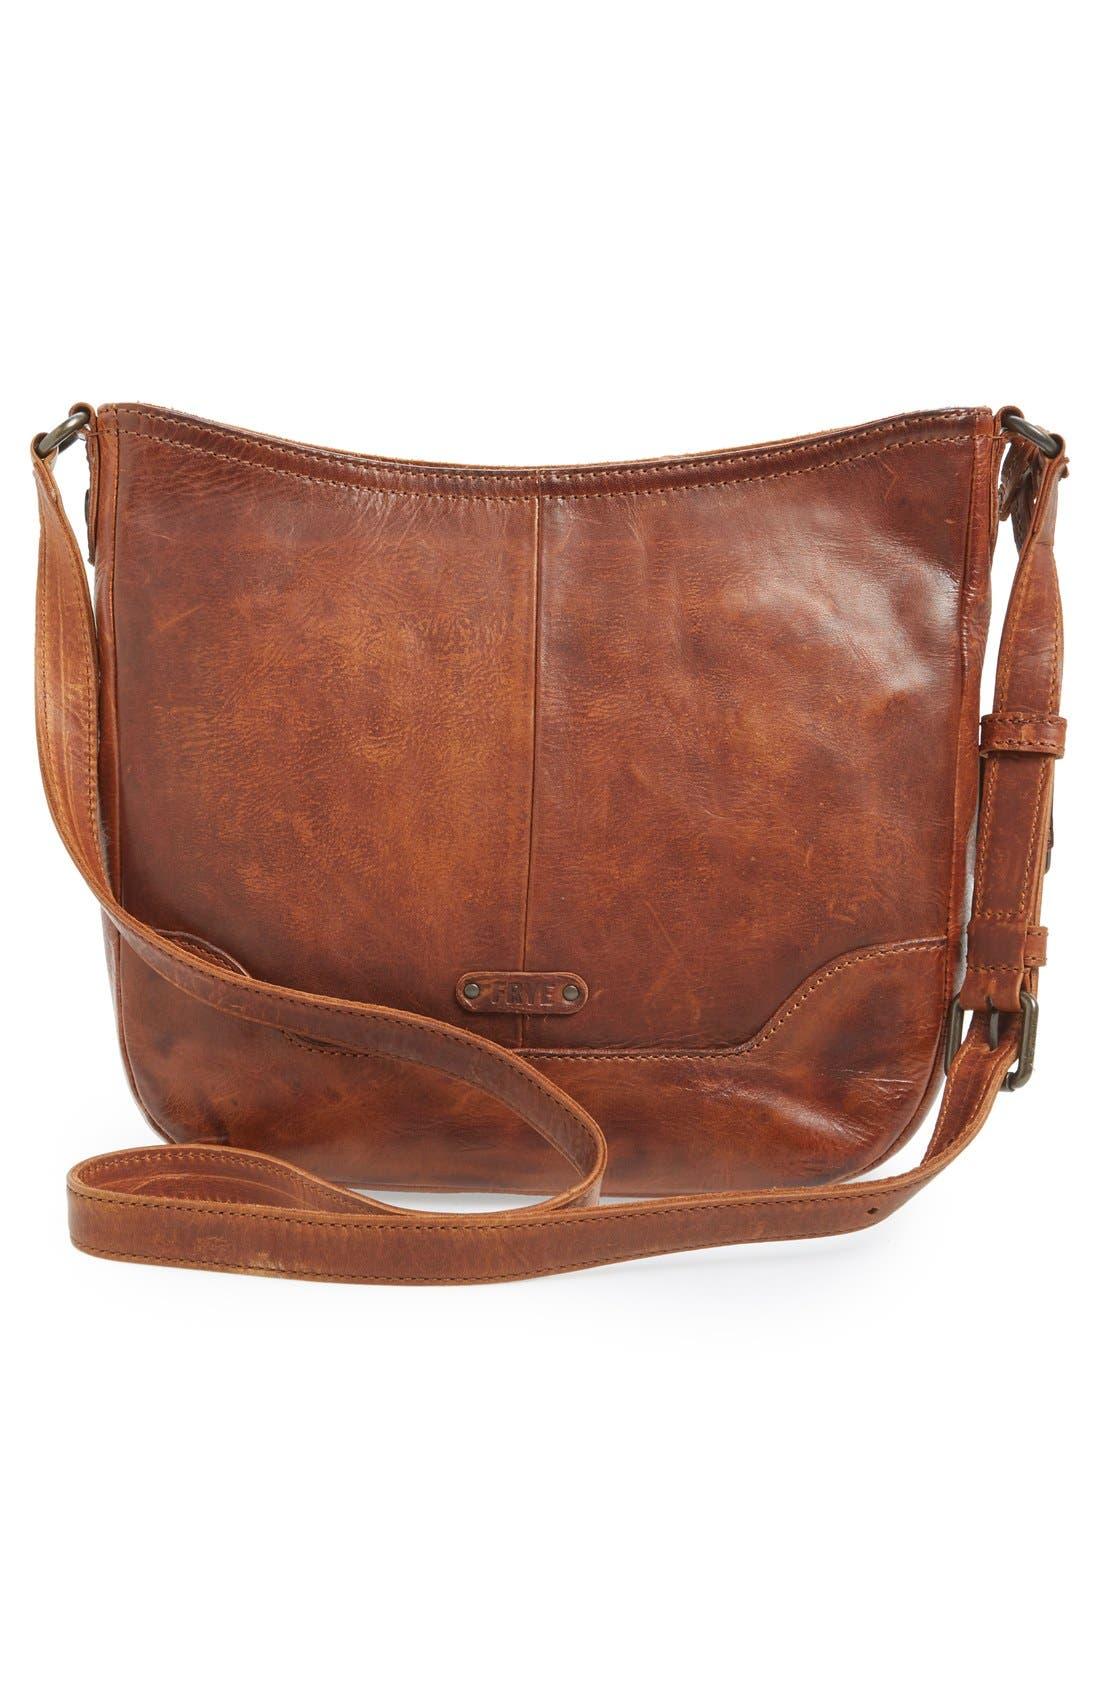 Melissa Button Crossbody Bag,                             Alternate thumbnail 3, color,                             Cognac